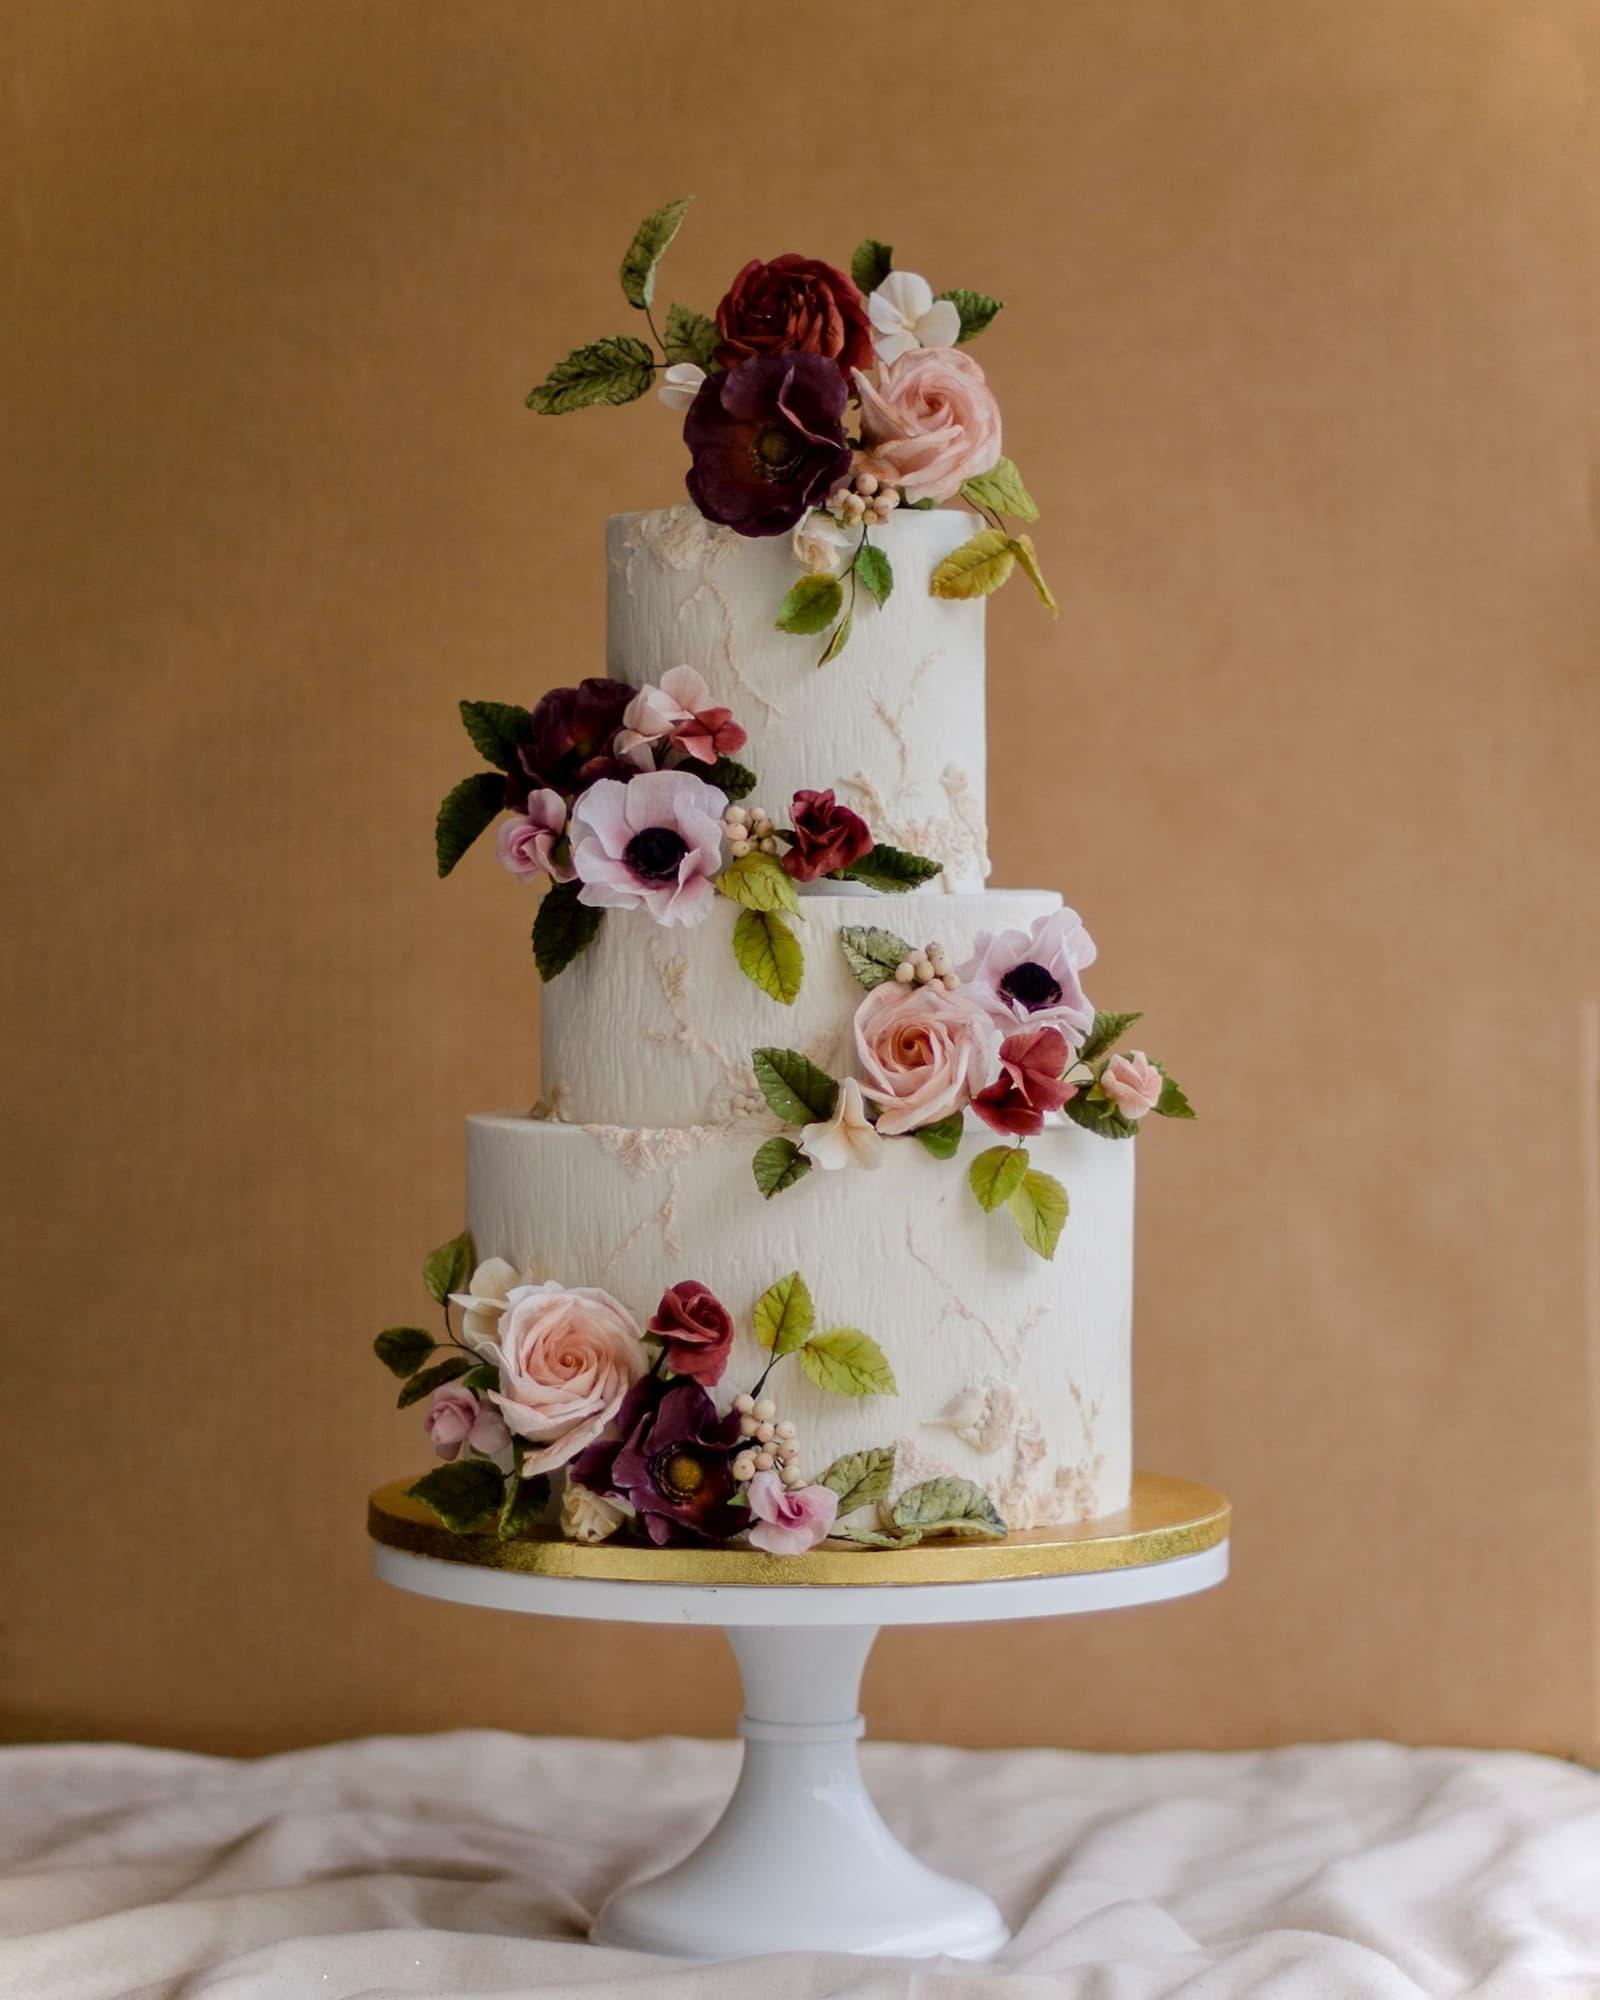 Roseraé Cakes Demure & Sweet